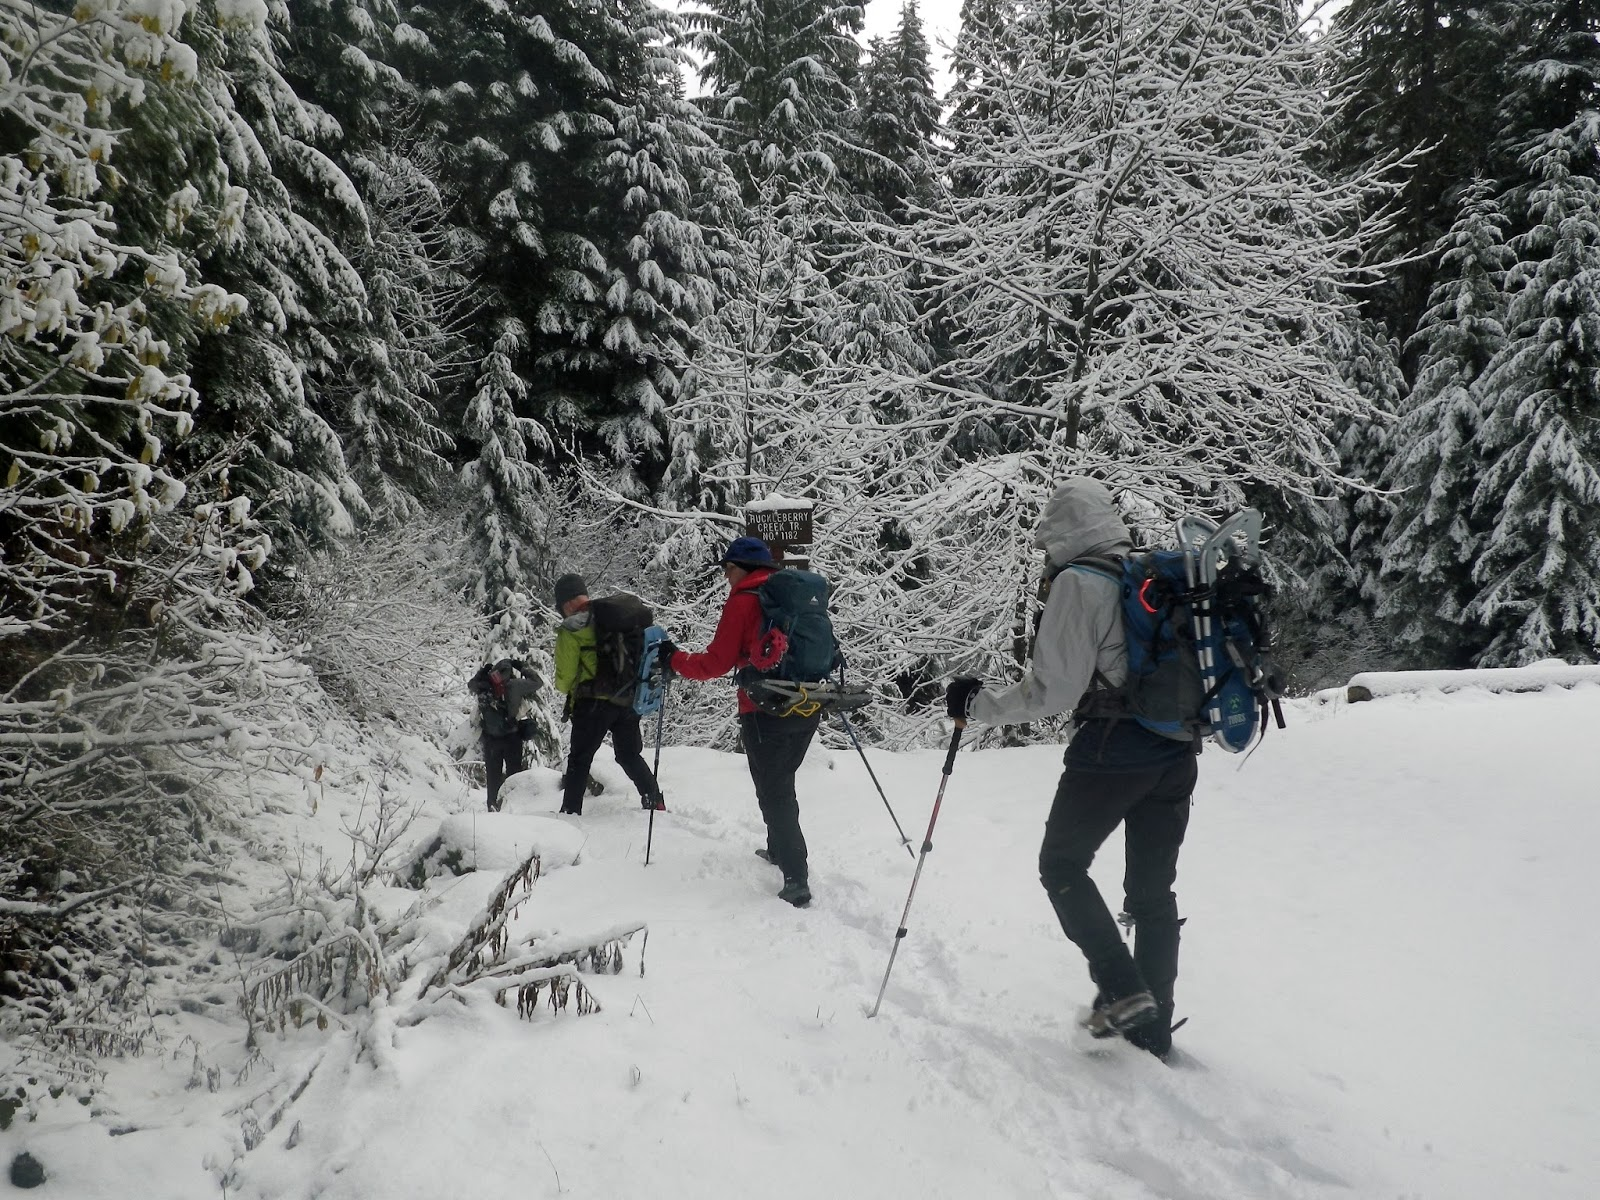 3 Great Winter Hikes in and Around Gatlinburg |Hiking Snow